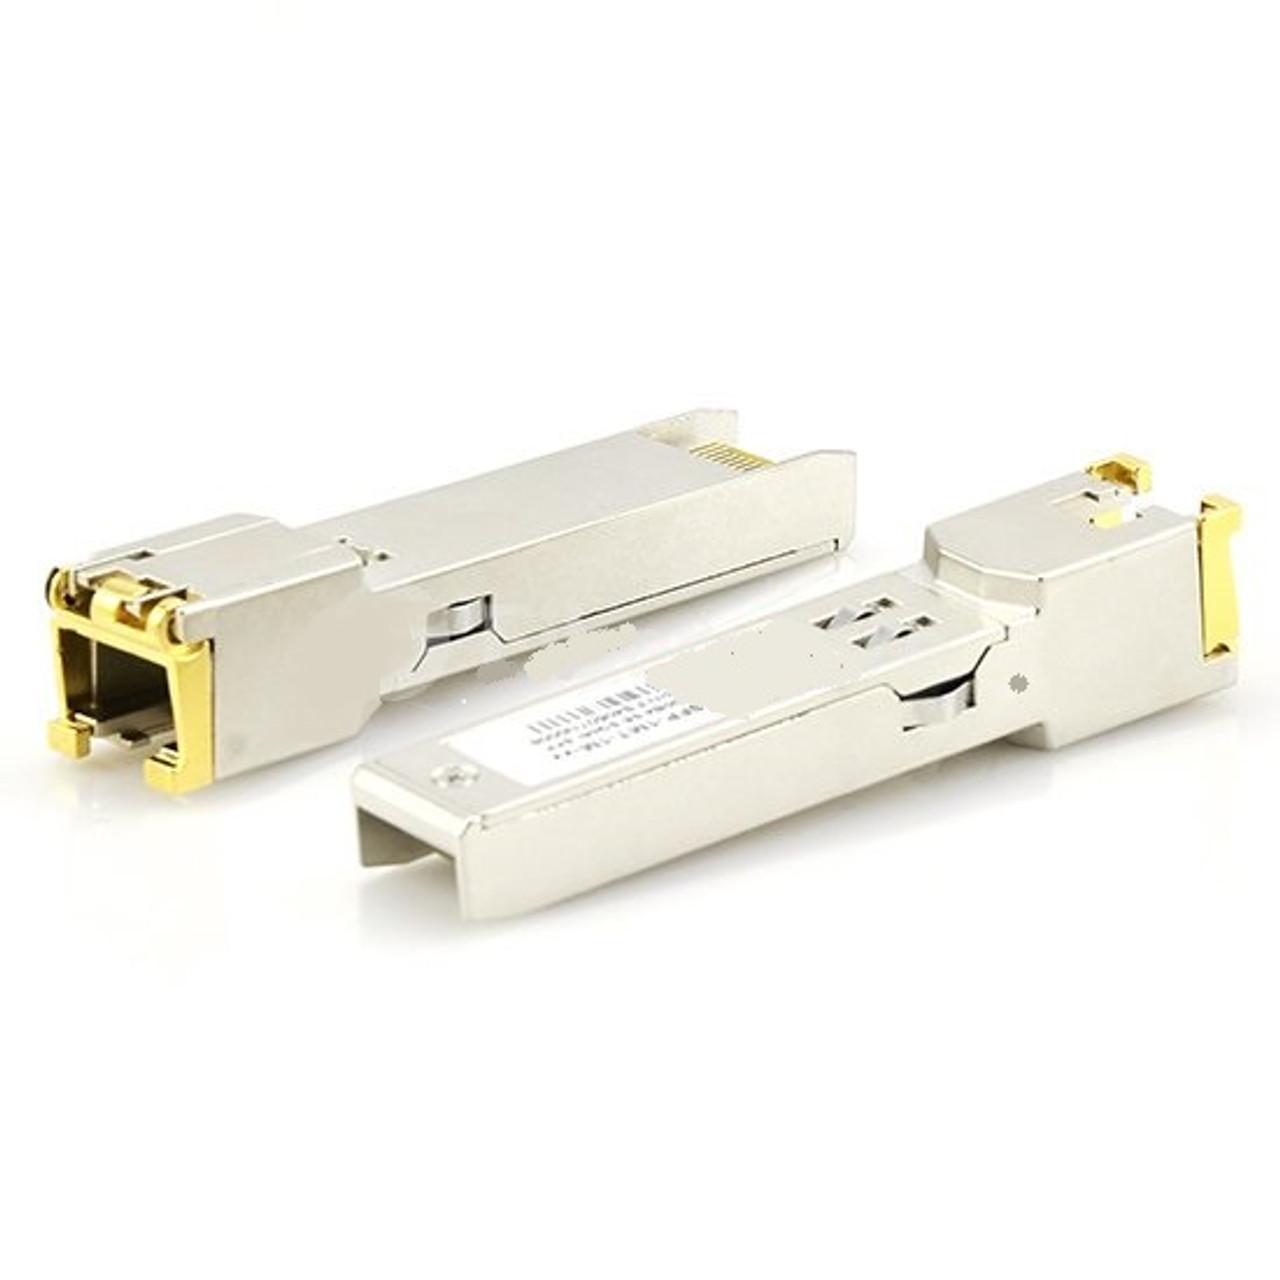 Generic AT-SPTX Allied Telesis Compatible 1000BASE-T SFP Copper RJ-45 100m Transceiver